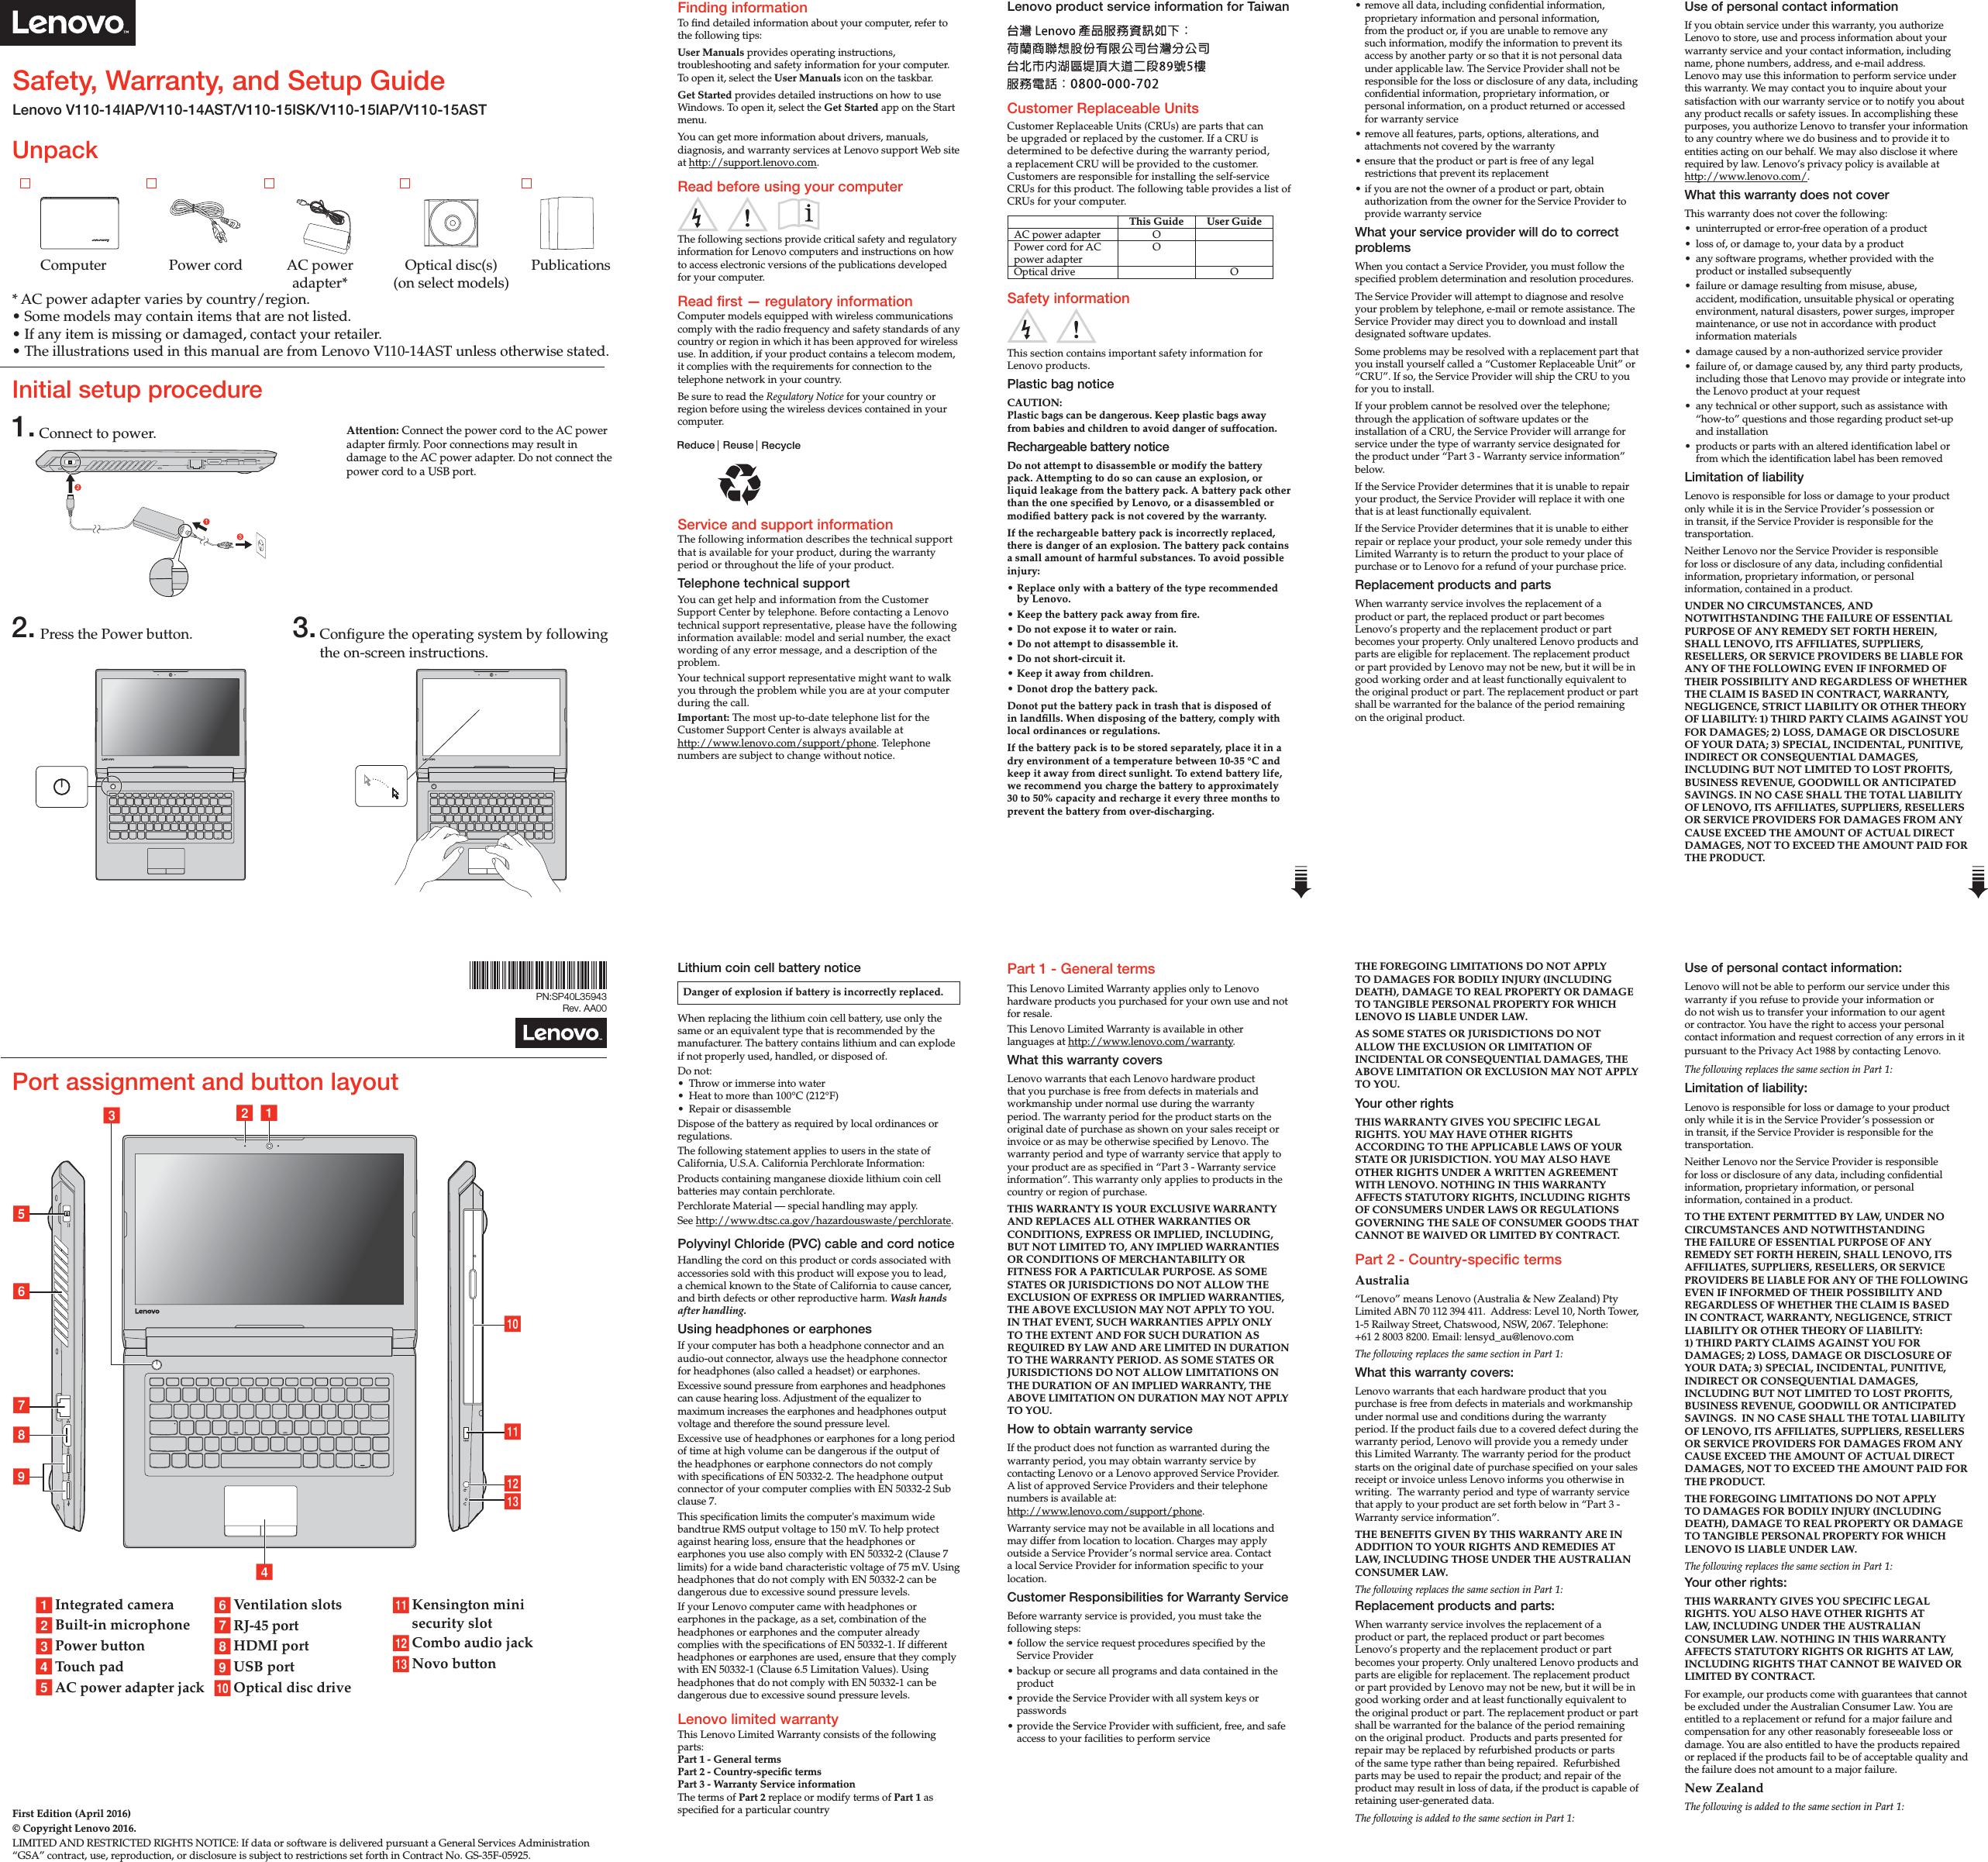 Thinkpad Audio Jack Wiring Diagram Explained Diagrams Laptop Power For Lenovo V110 14 15iap 15ast 15isk Swsg En User Manual English Mic Headphone